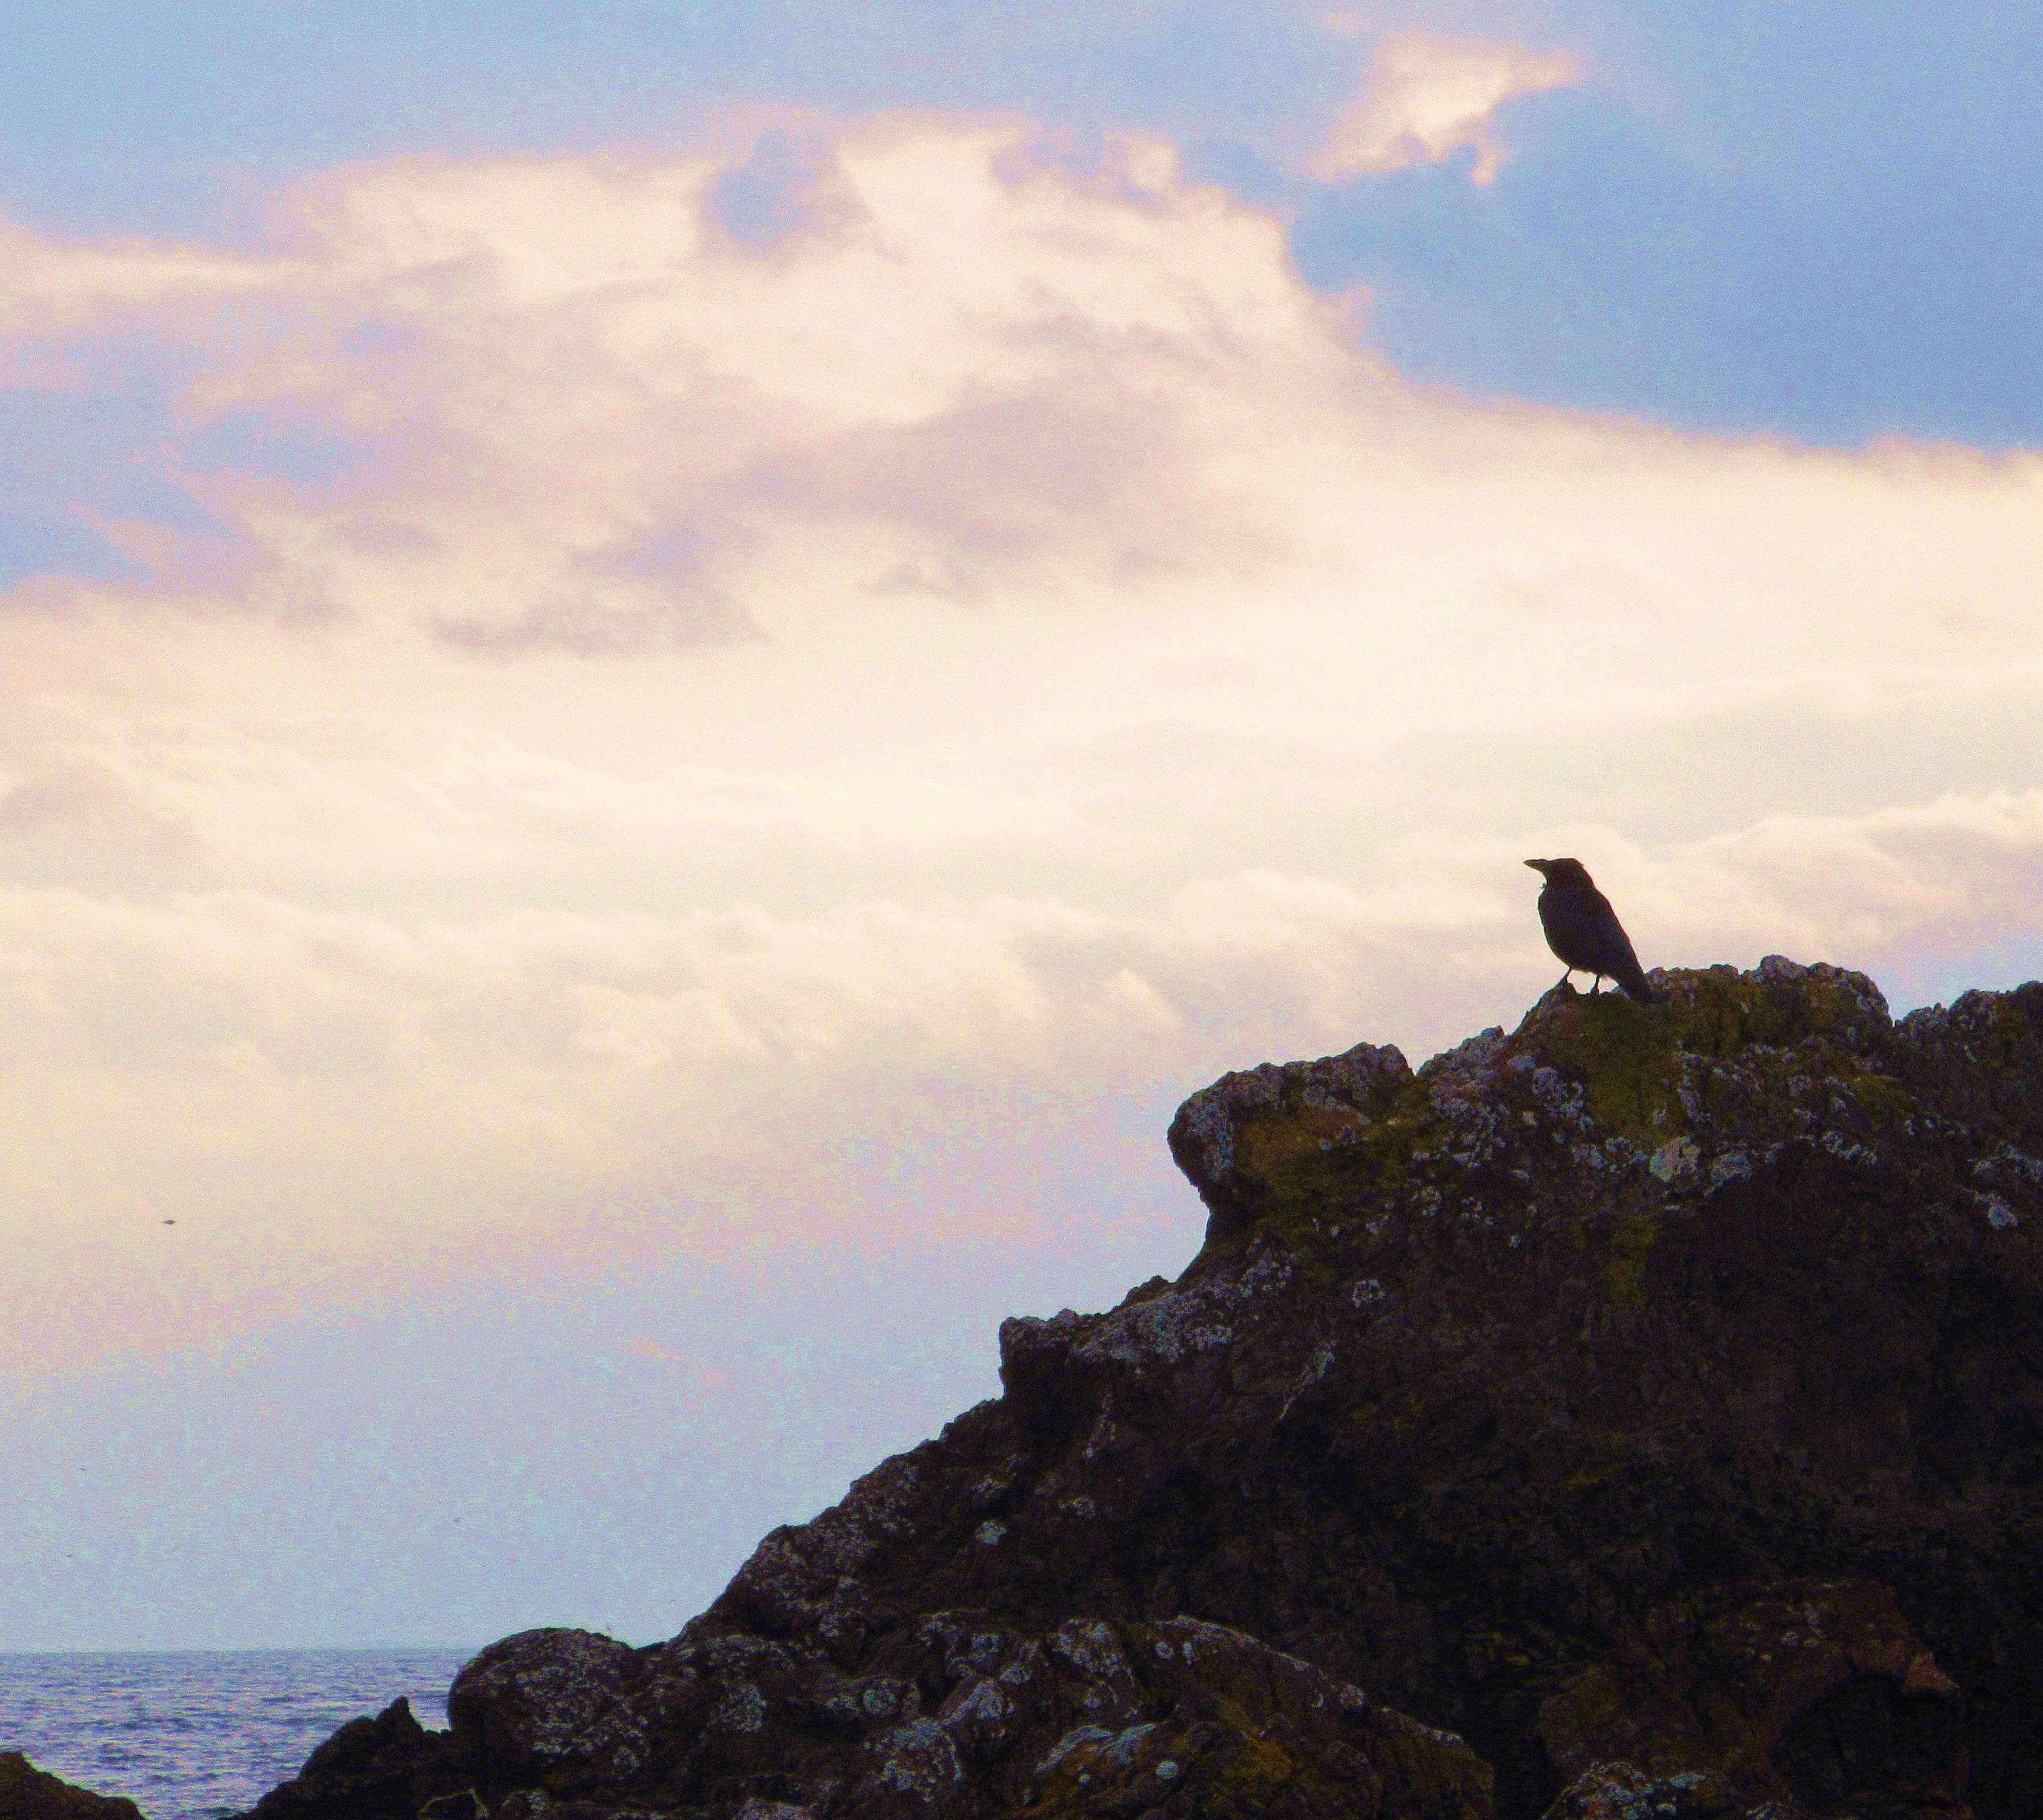 bird on rock alone